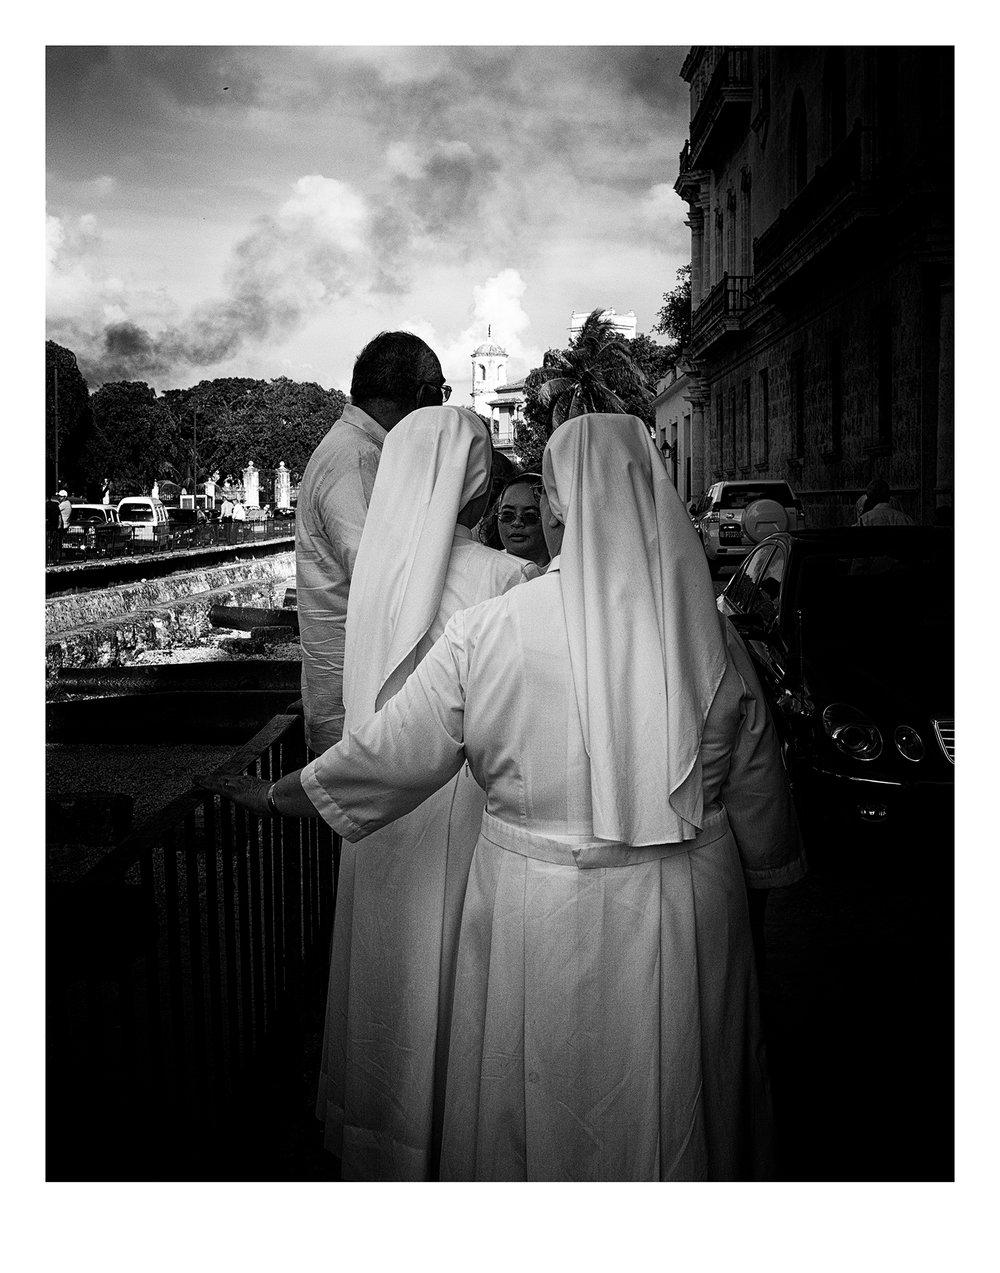 nuns-priests02.jpg